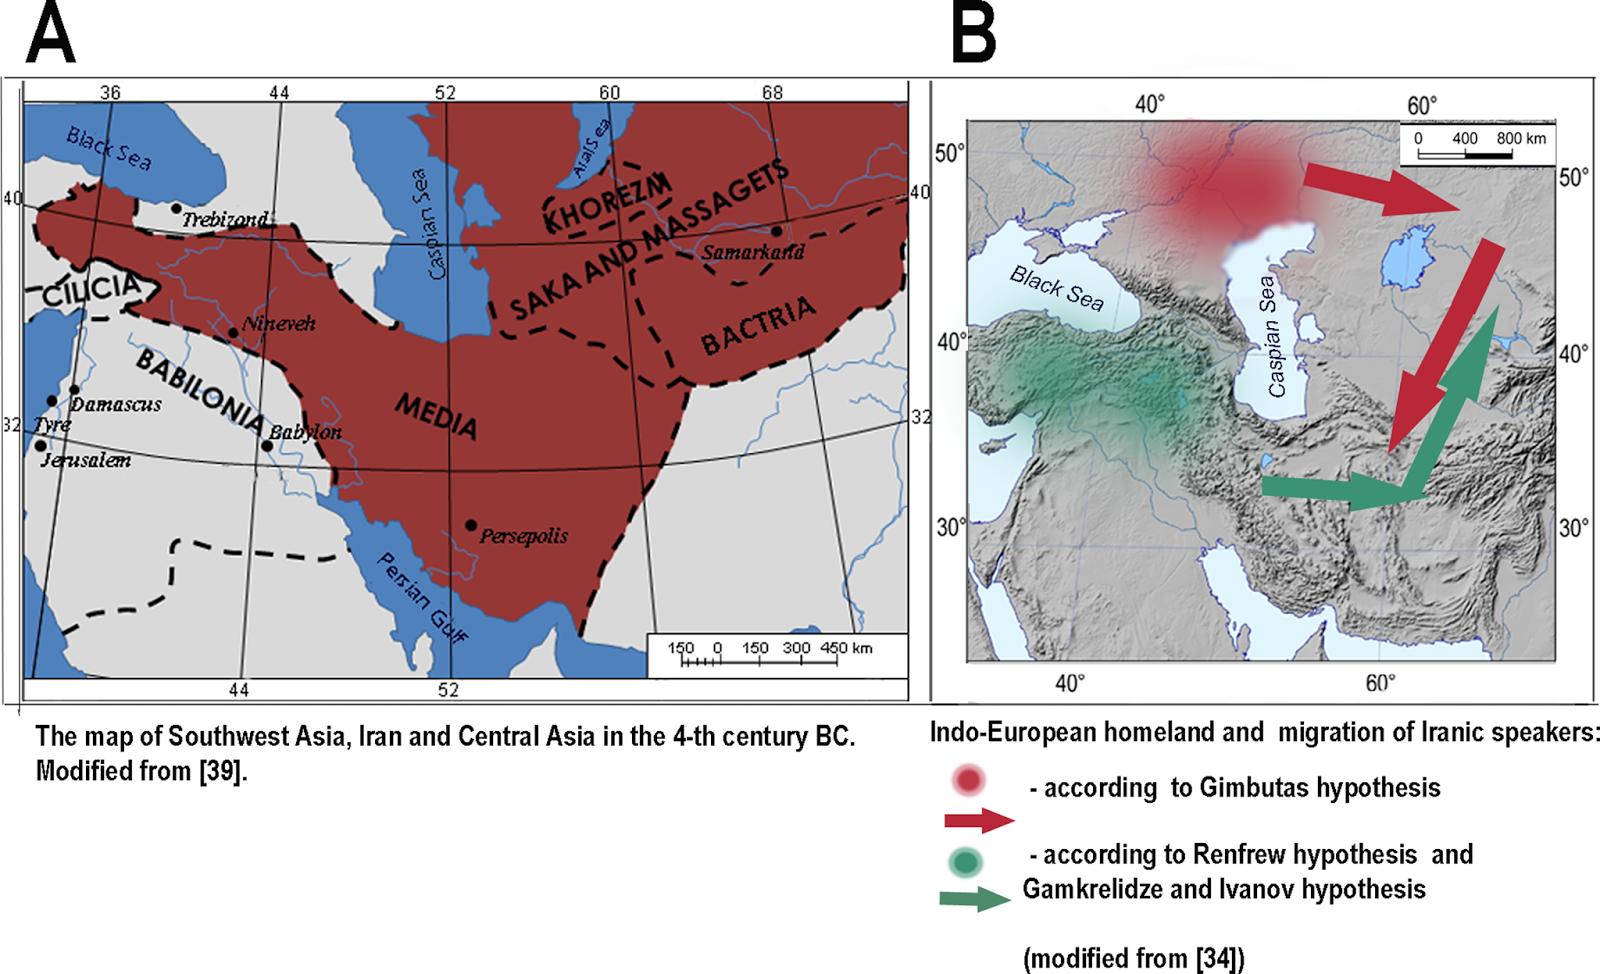 Dienekes' Anthropology Blog: Haplogroup G1, Y-chromosome